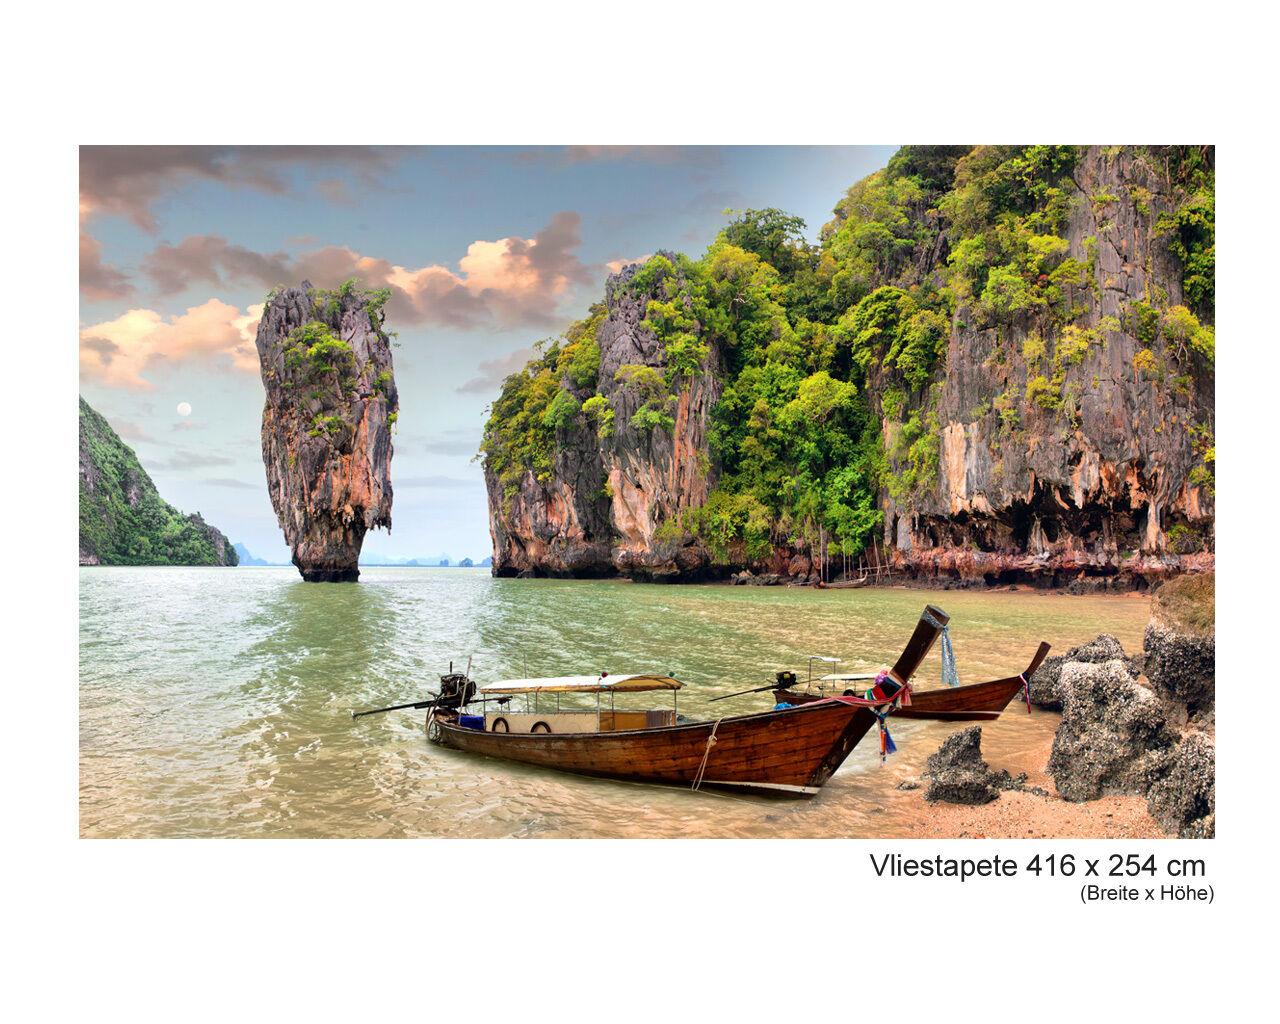 Vliestapete Tapete Wandbild Thailand James Bond Fels Insel Strand Stein Natur